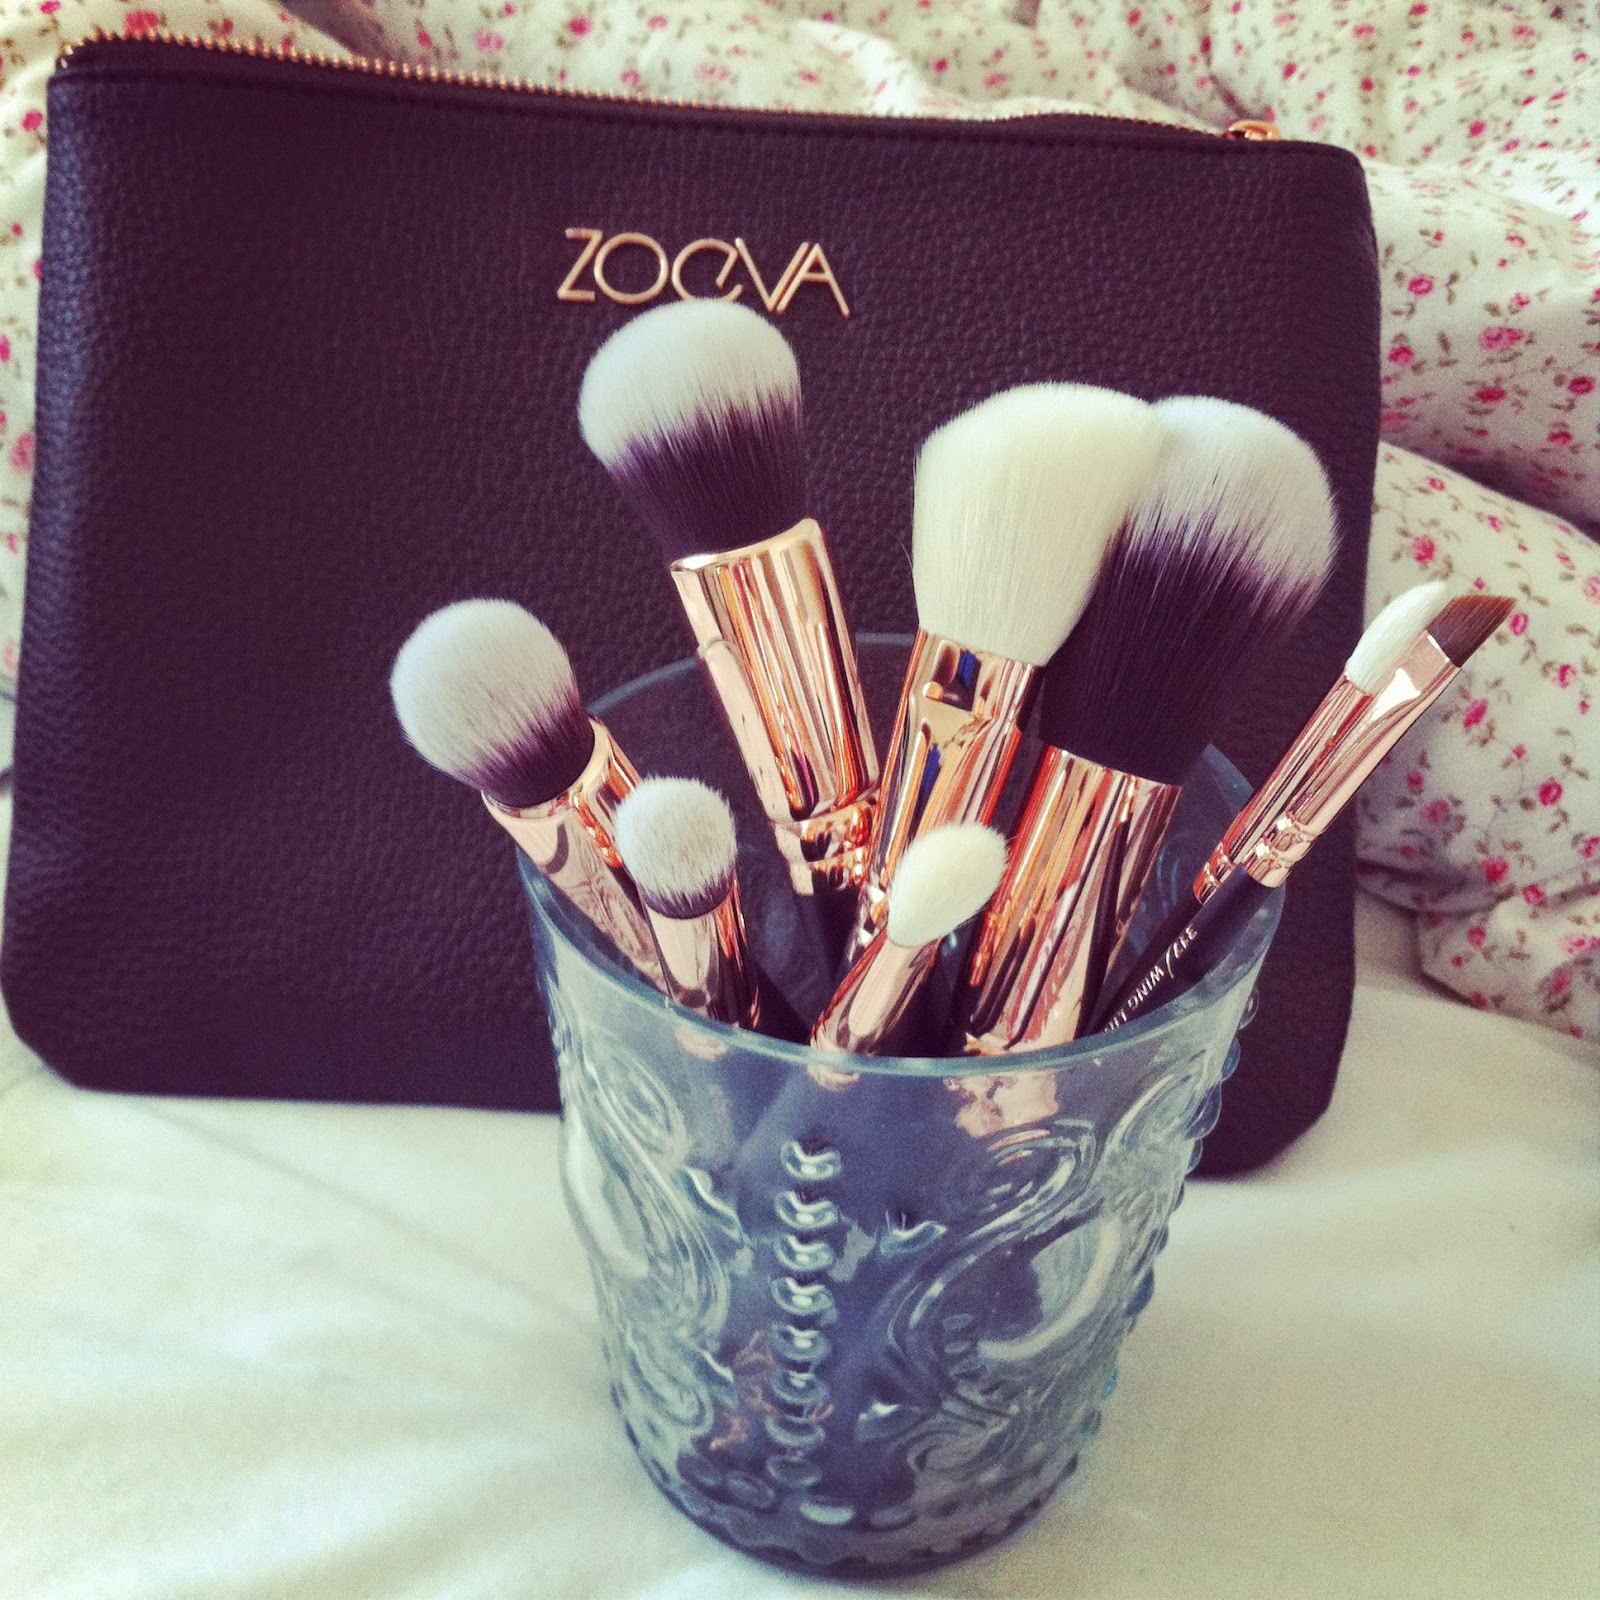 grace 39 s notebook zoeva rose gold luxury brush set. Black Bedroom Furniture Sets. Home Design Ideas